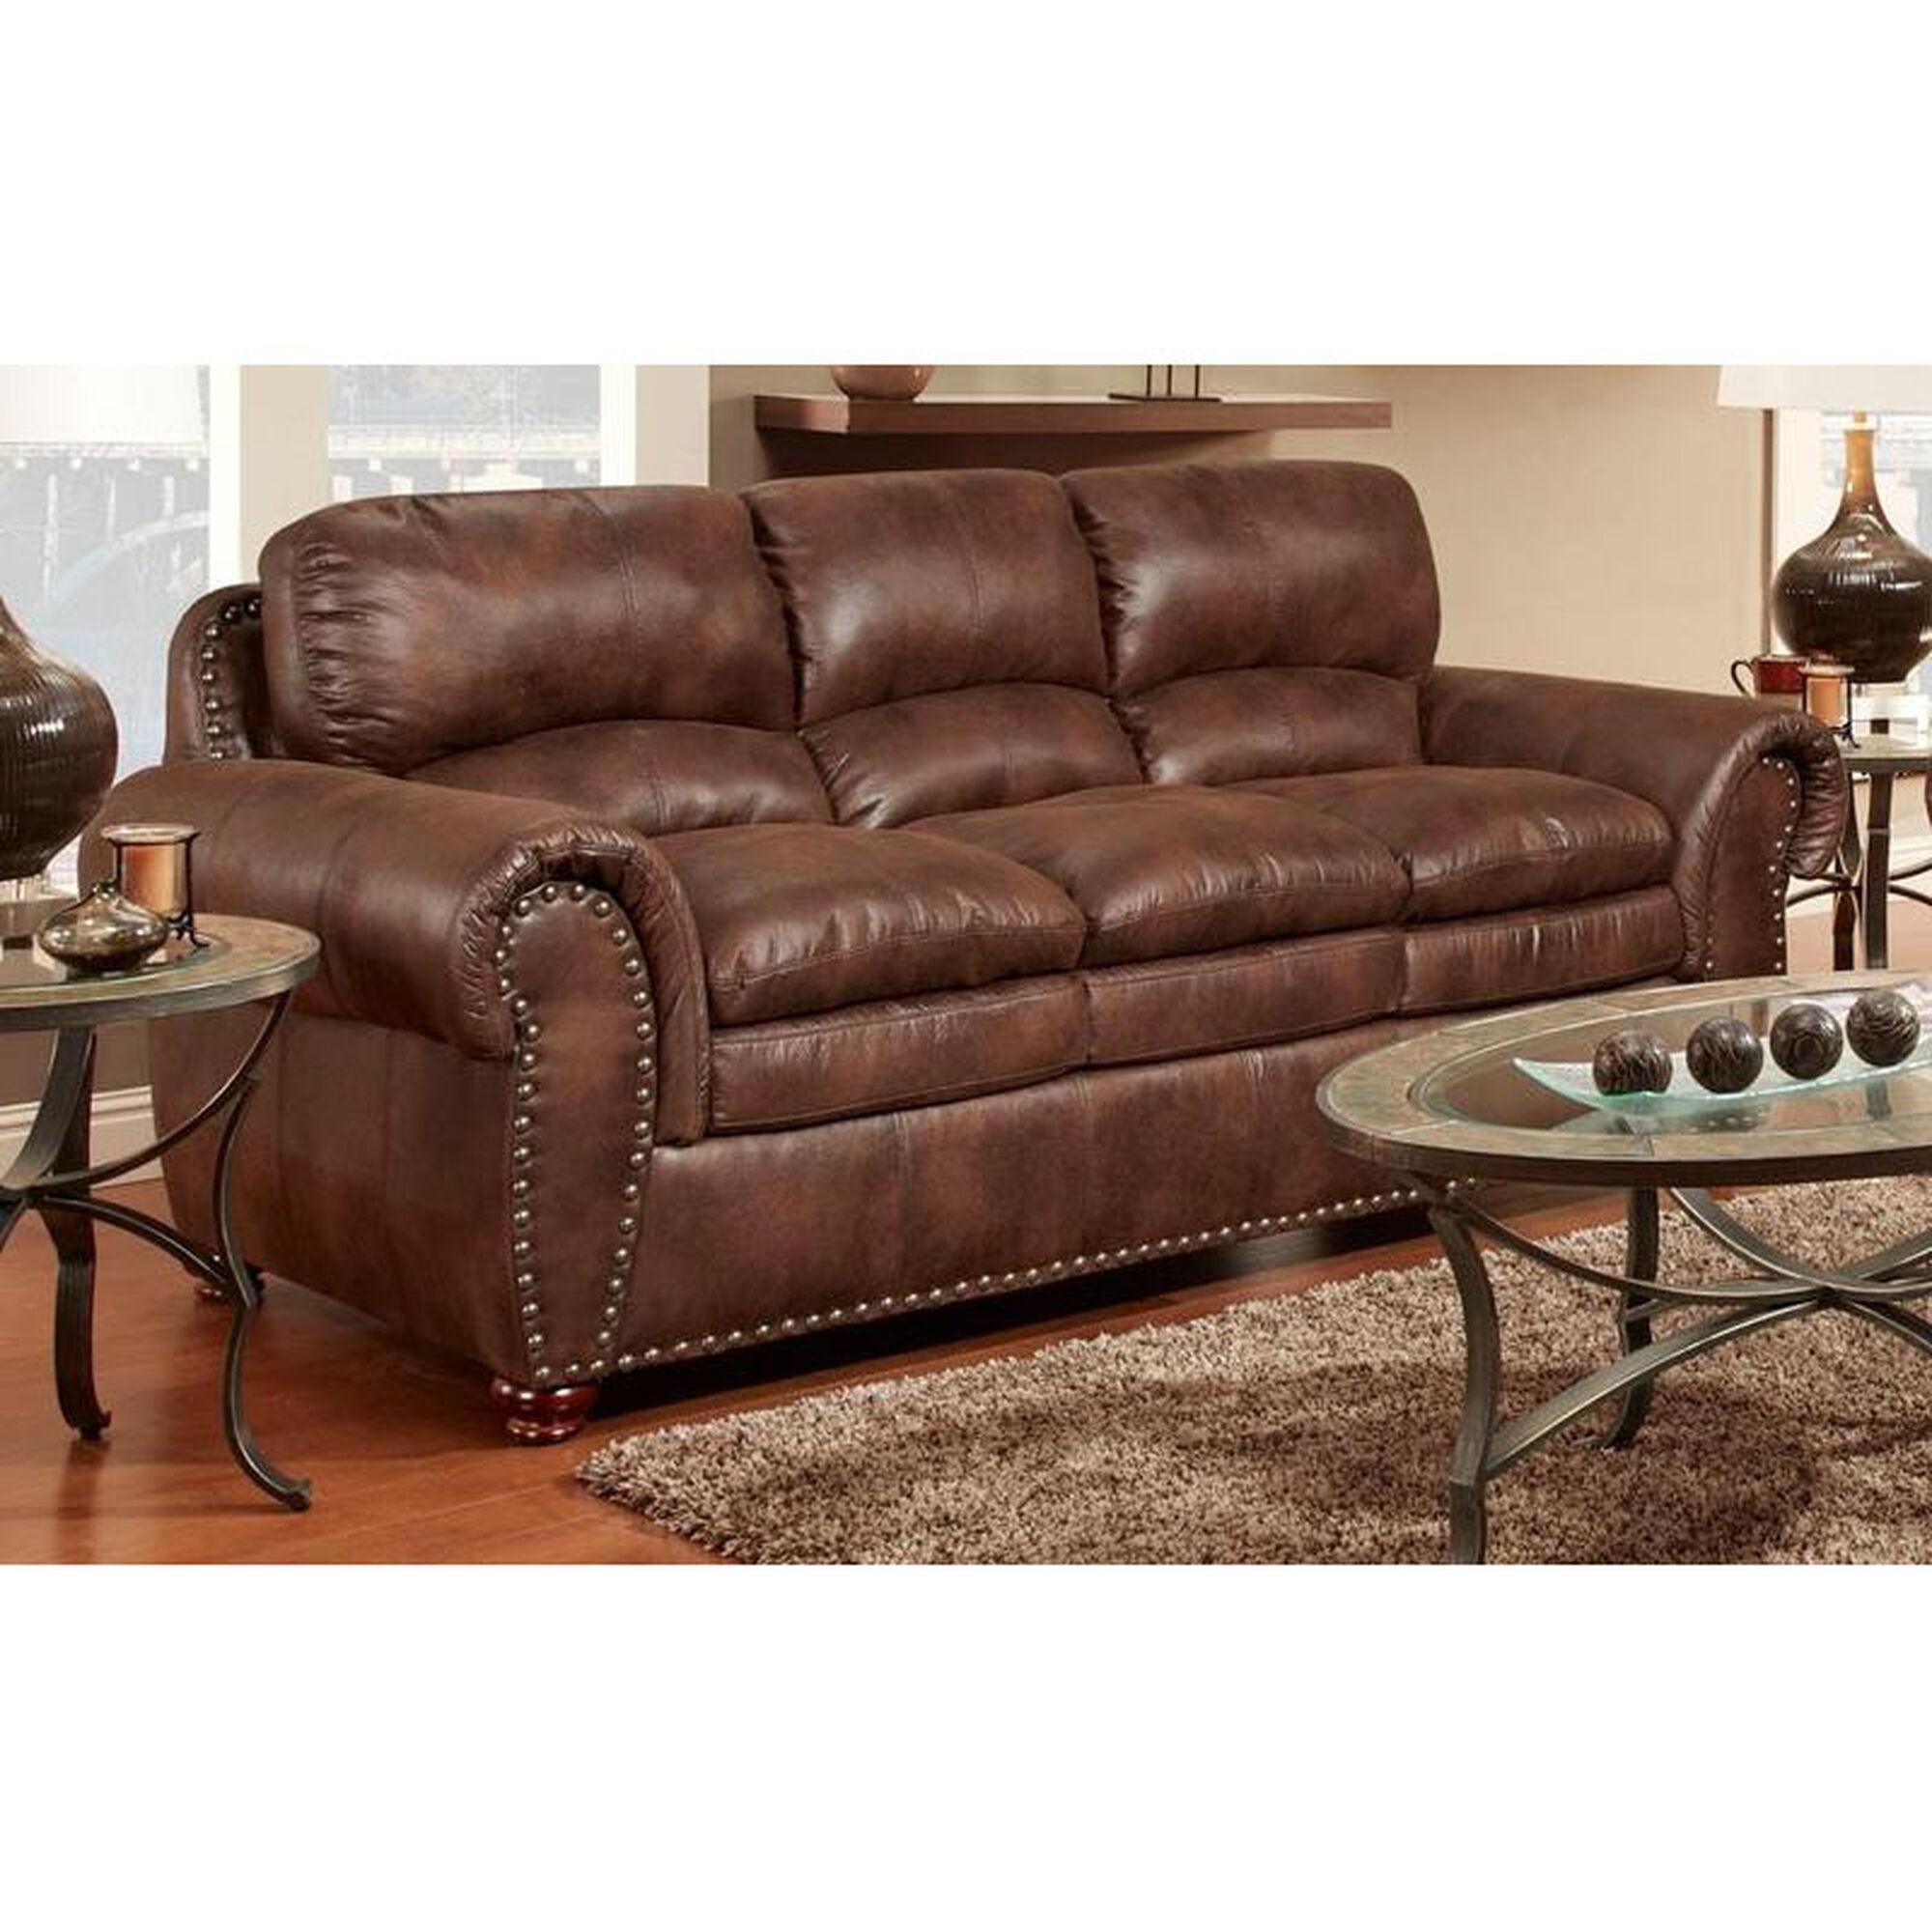 Sofa padre espresso 471450 s pe for Home furniture sites